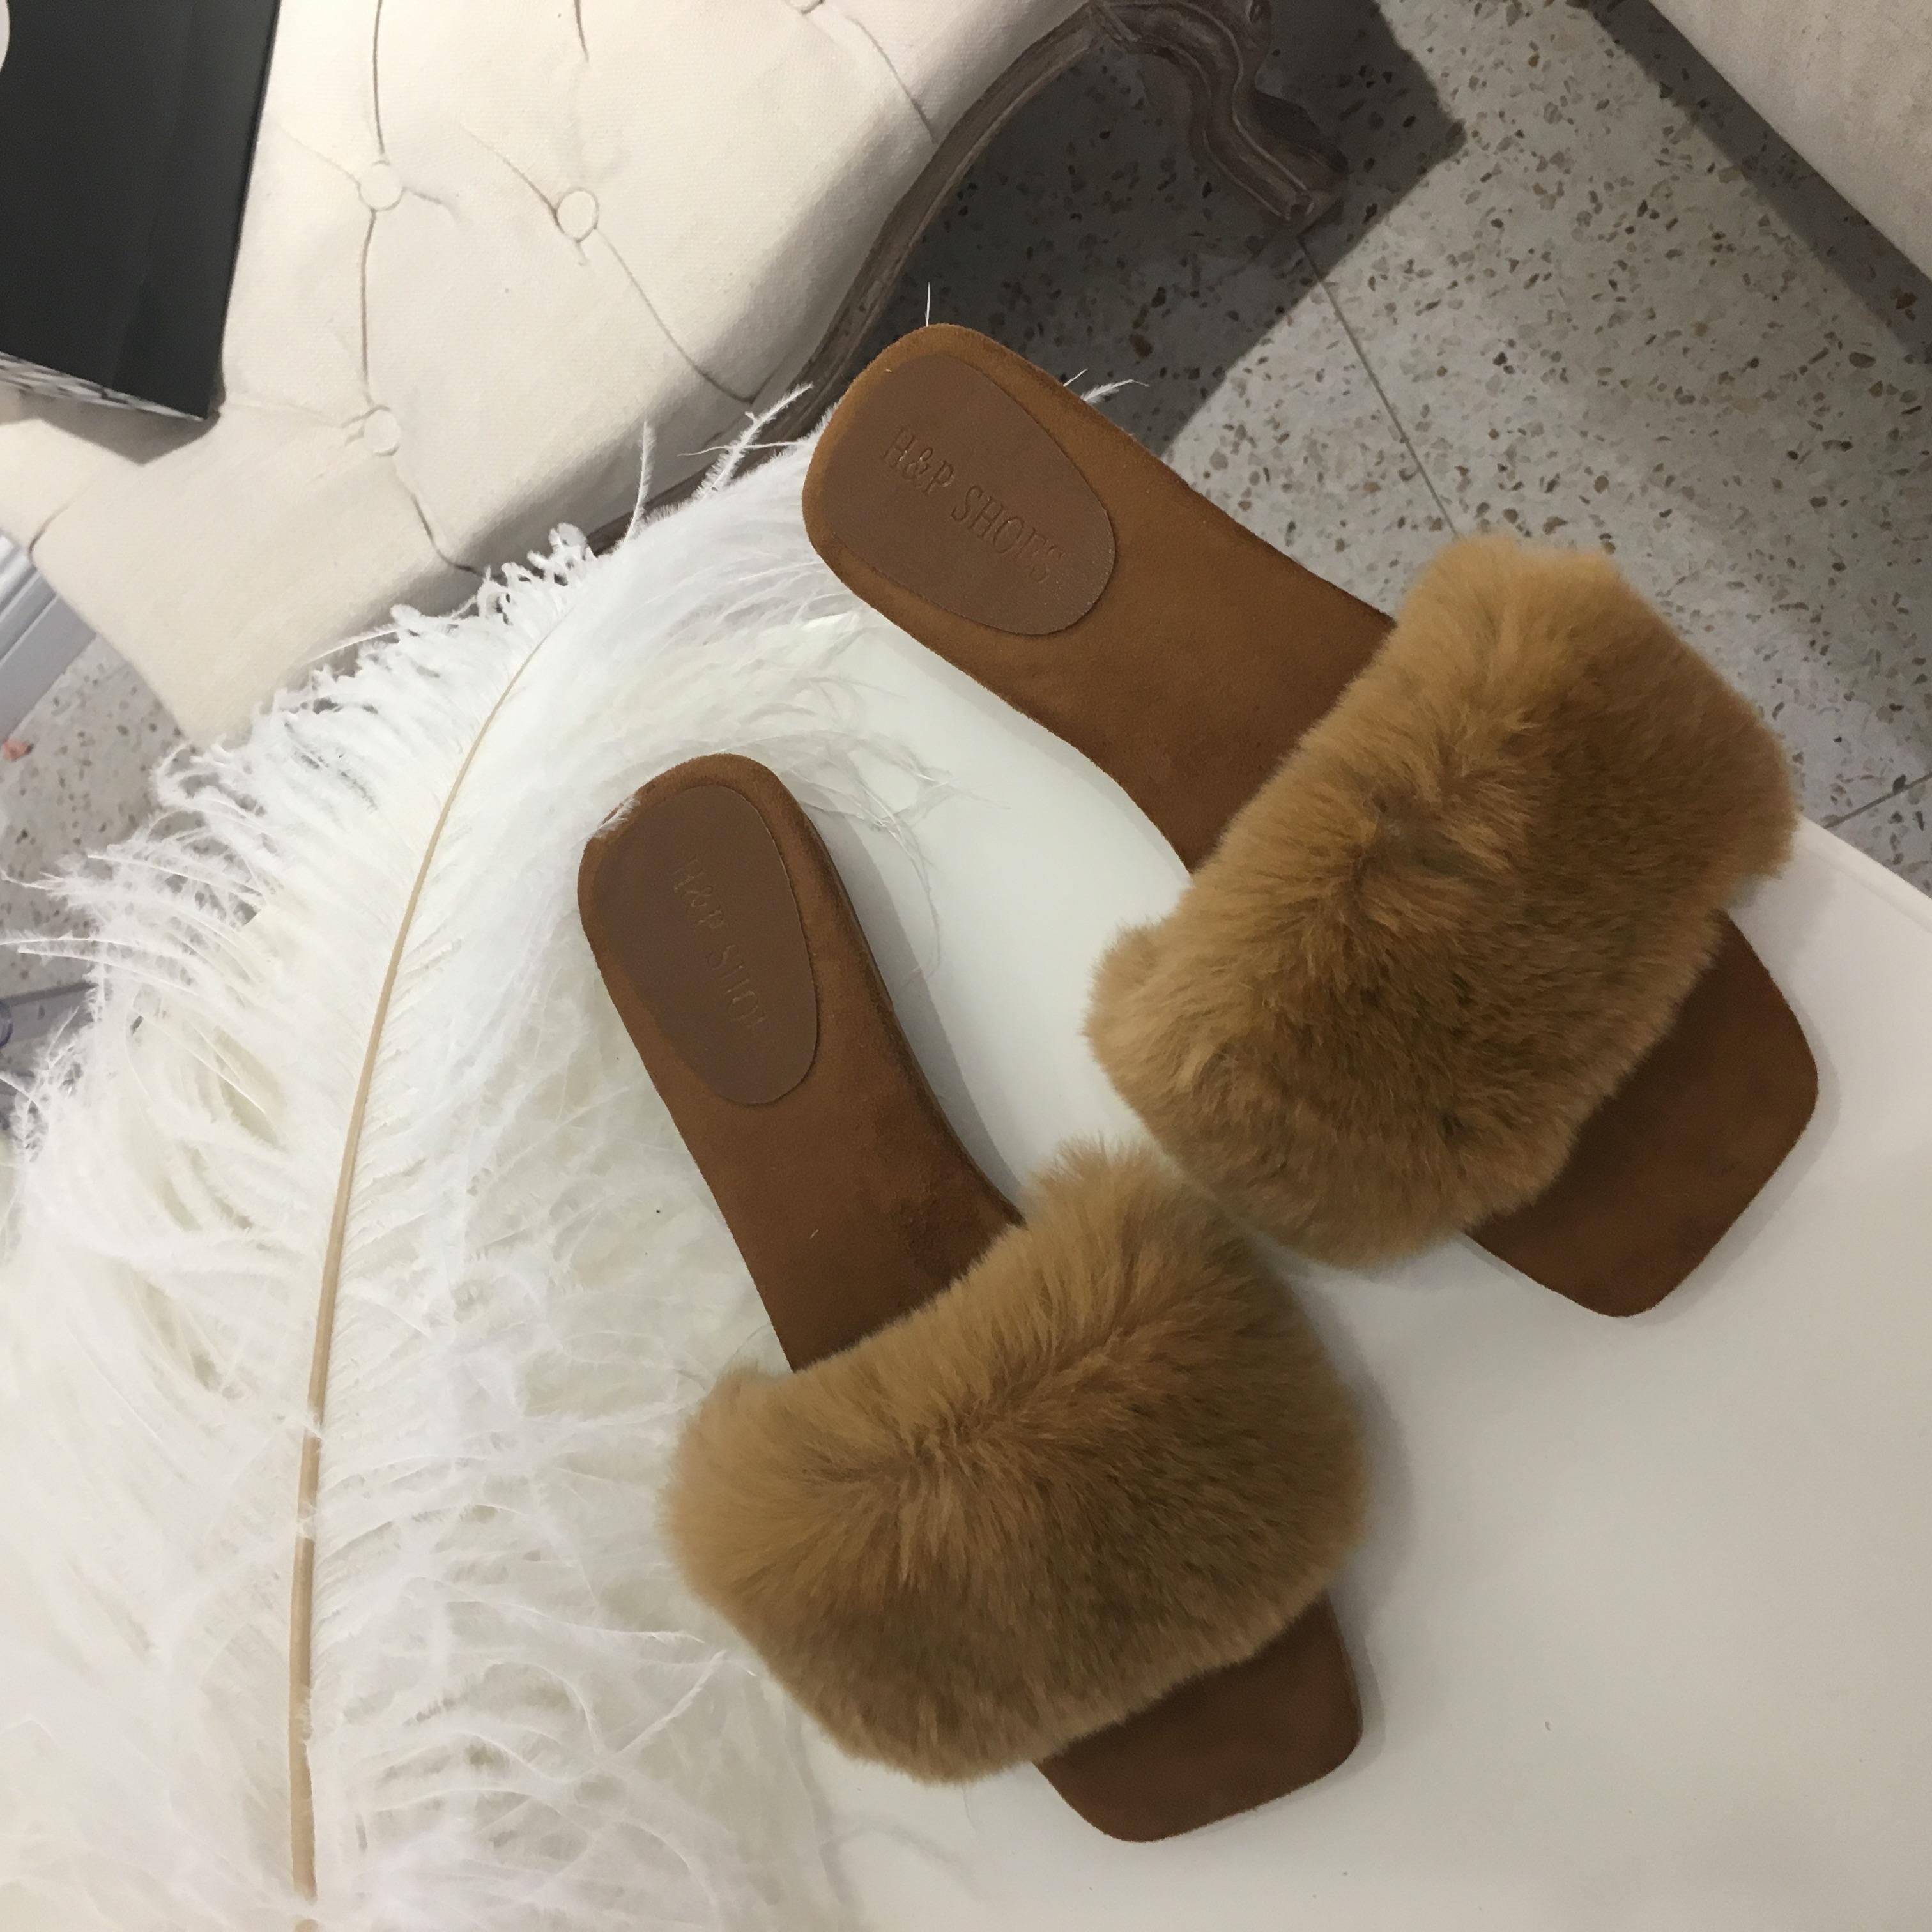 dbd5b88cda6b INS Online Celebrity Sandals Furry Slipper Autumn New Style Rex Rabbit Fur  Fashion Outer Wear Flat